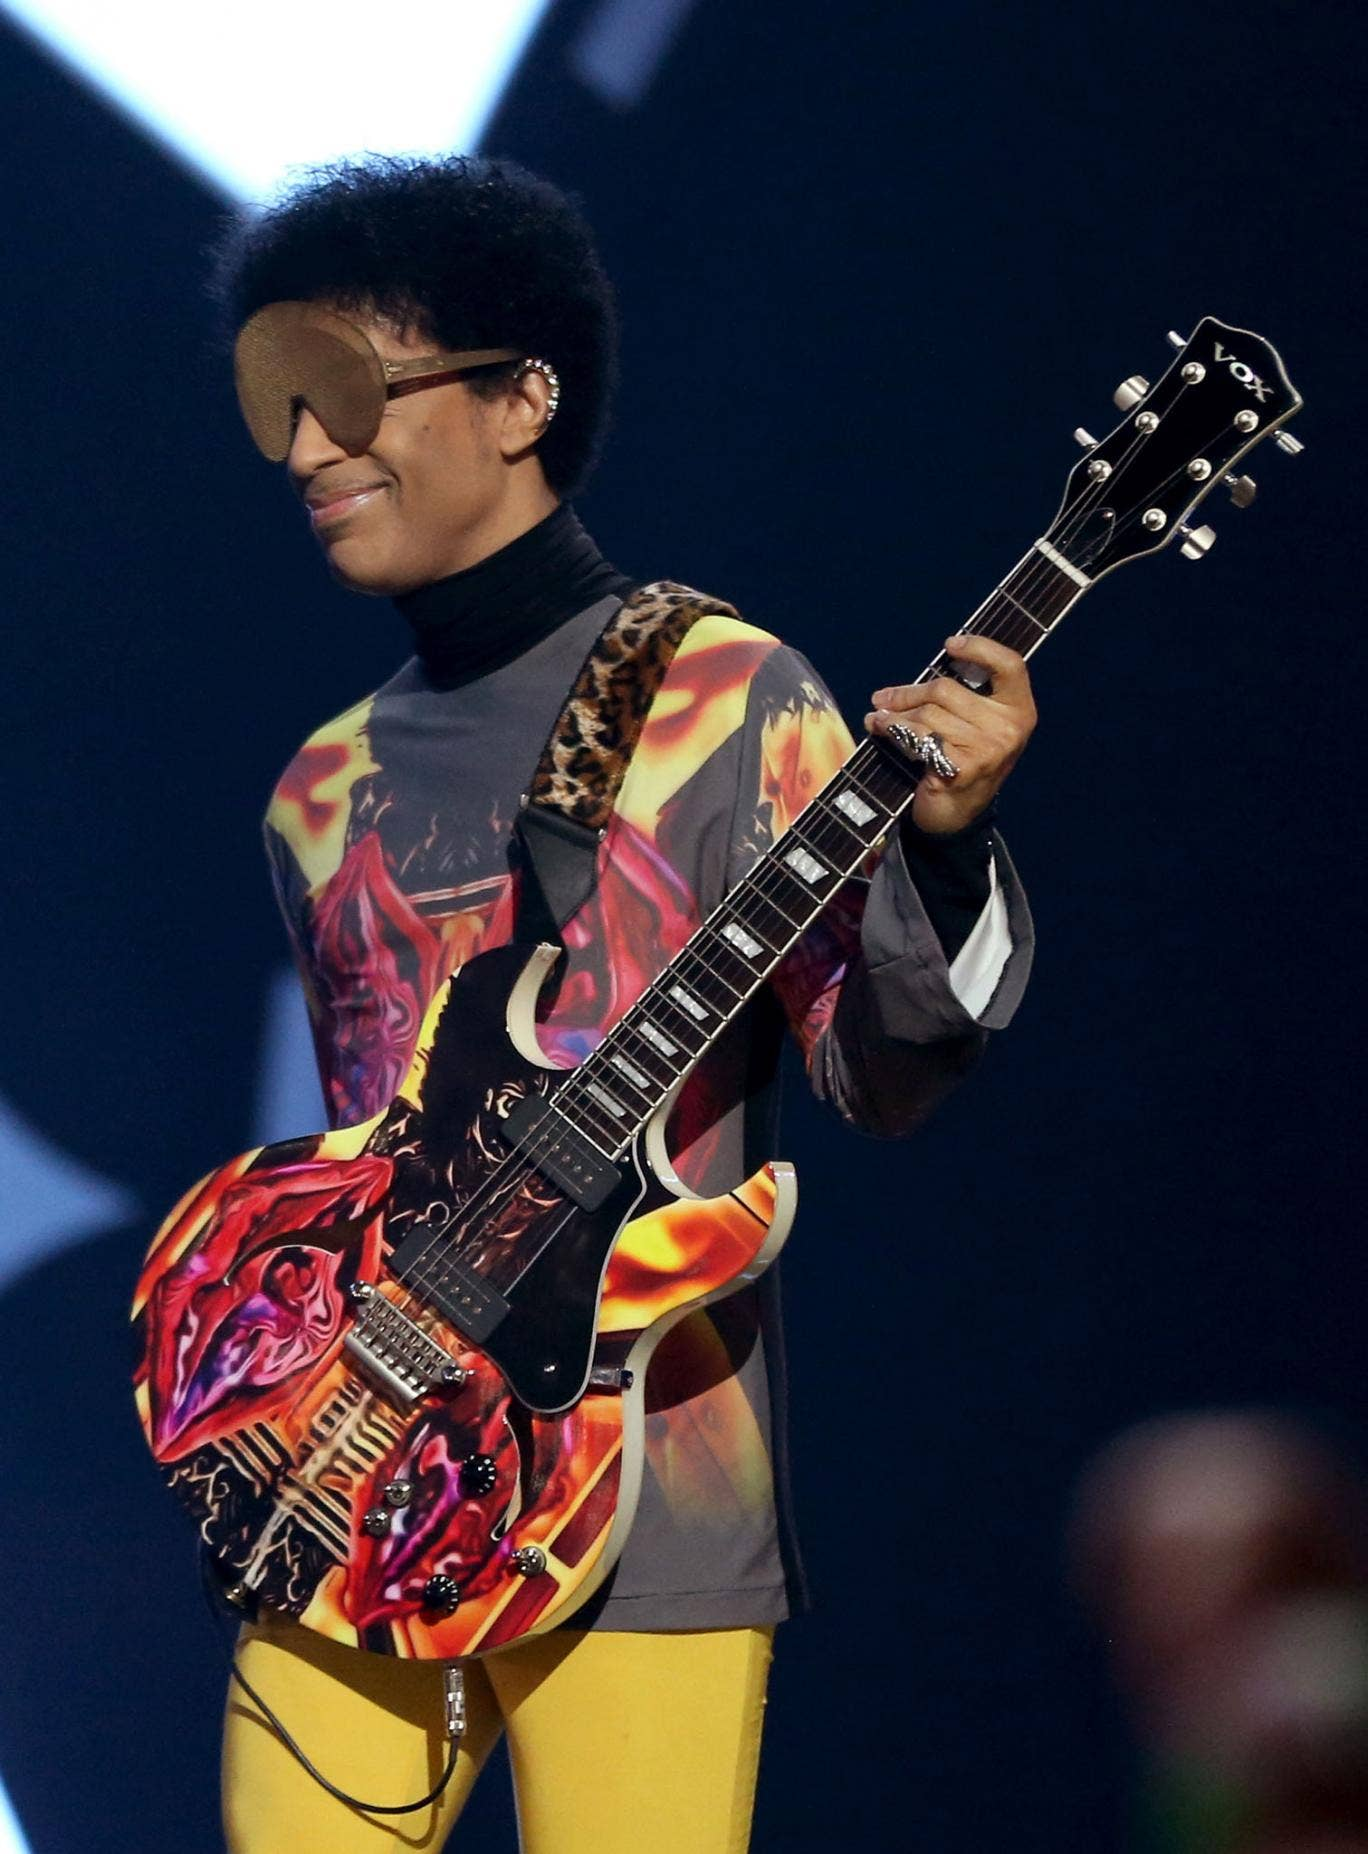 Prince performing in September 2012